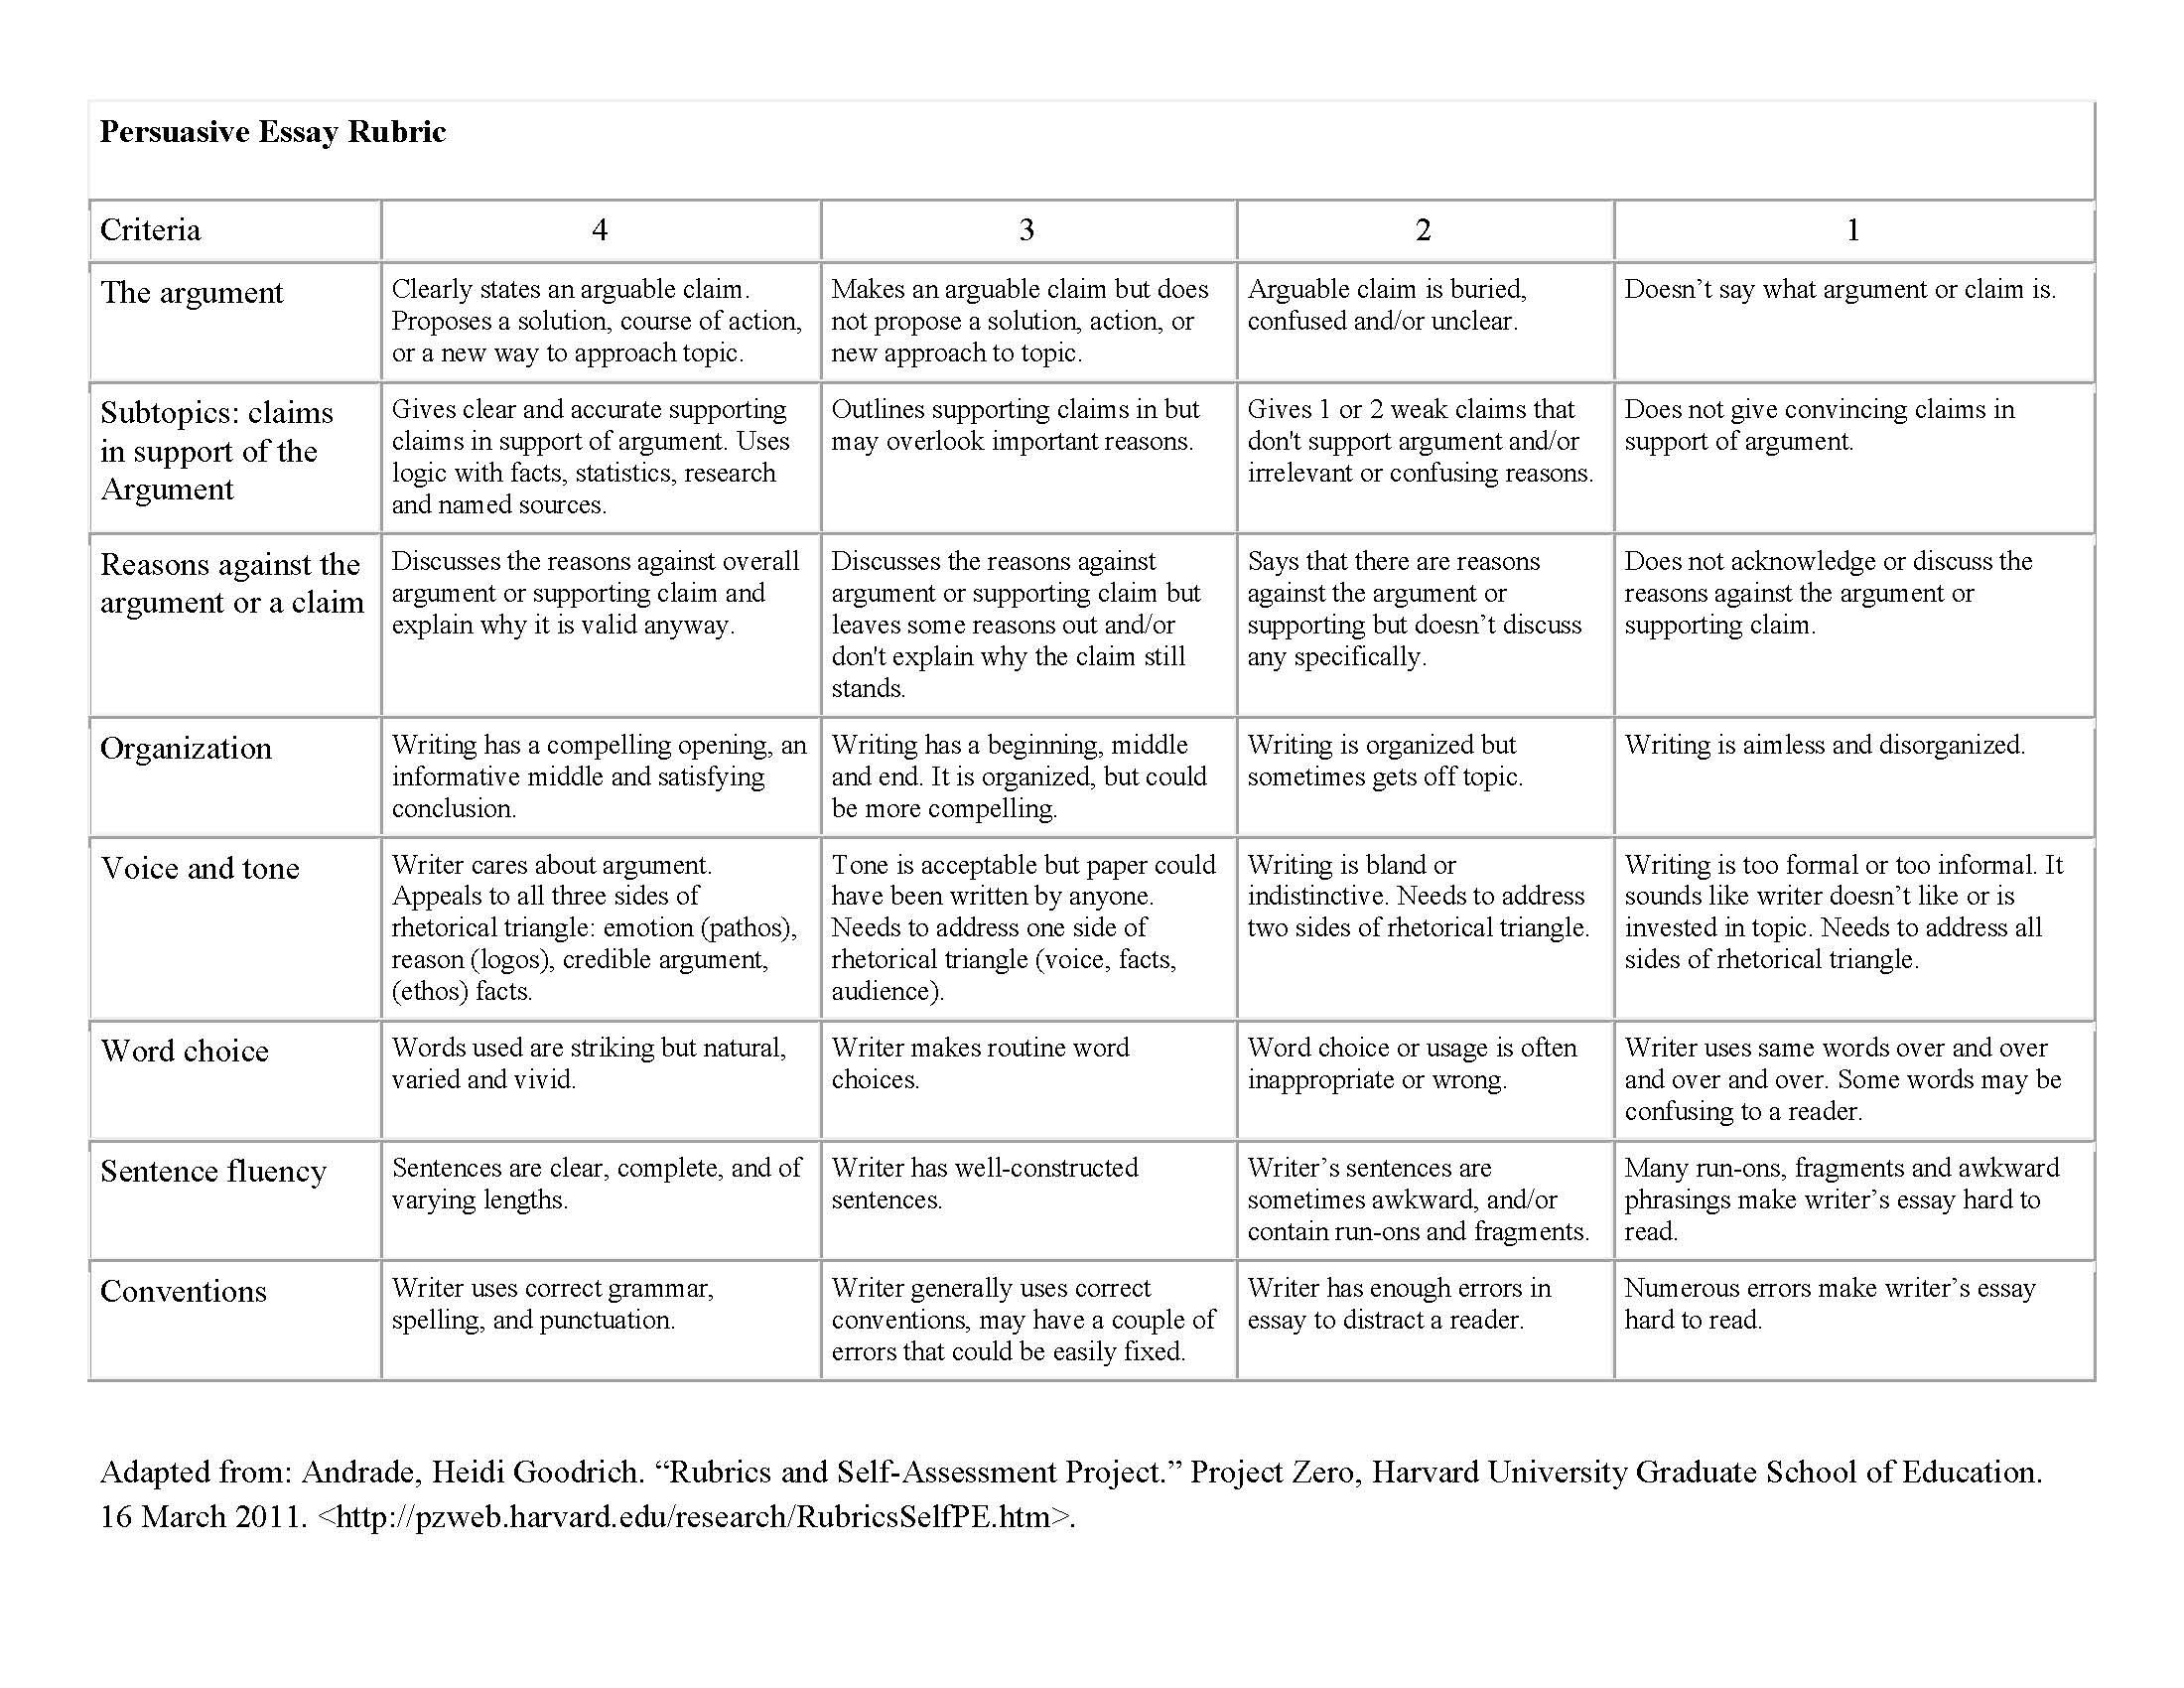 019 Good Persuasive Essay Topics Handout Rubriccb Amazing For College Argumentative High School Full